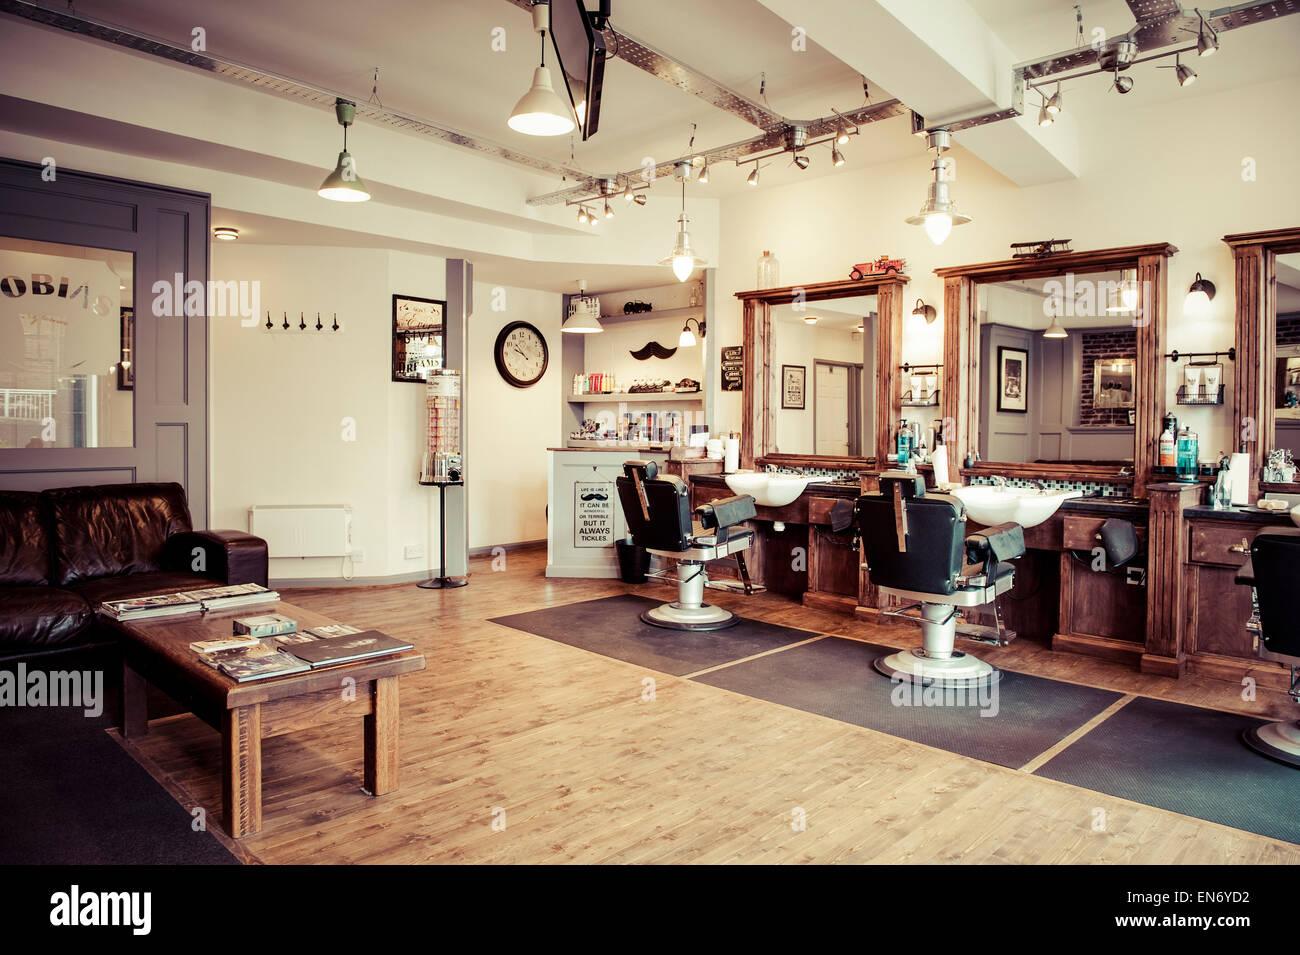 men s barber shop retro styled interior design stock photo rh alamy com interior barbershop design ideas barber shop shop interior design